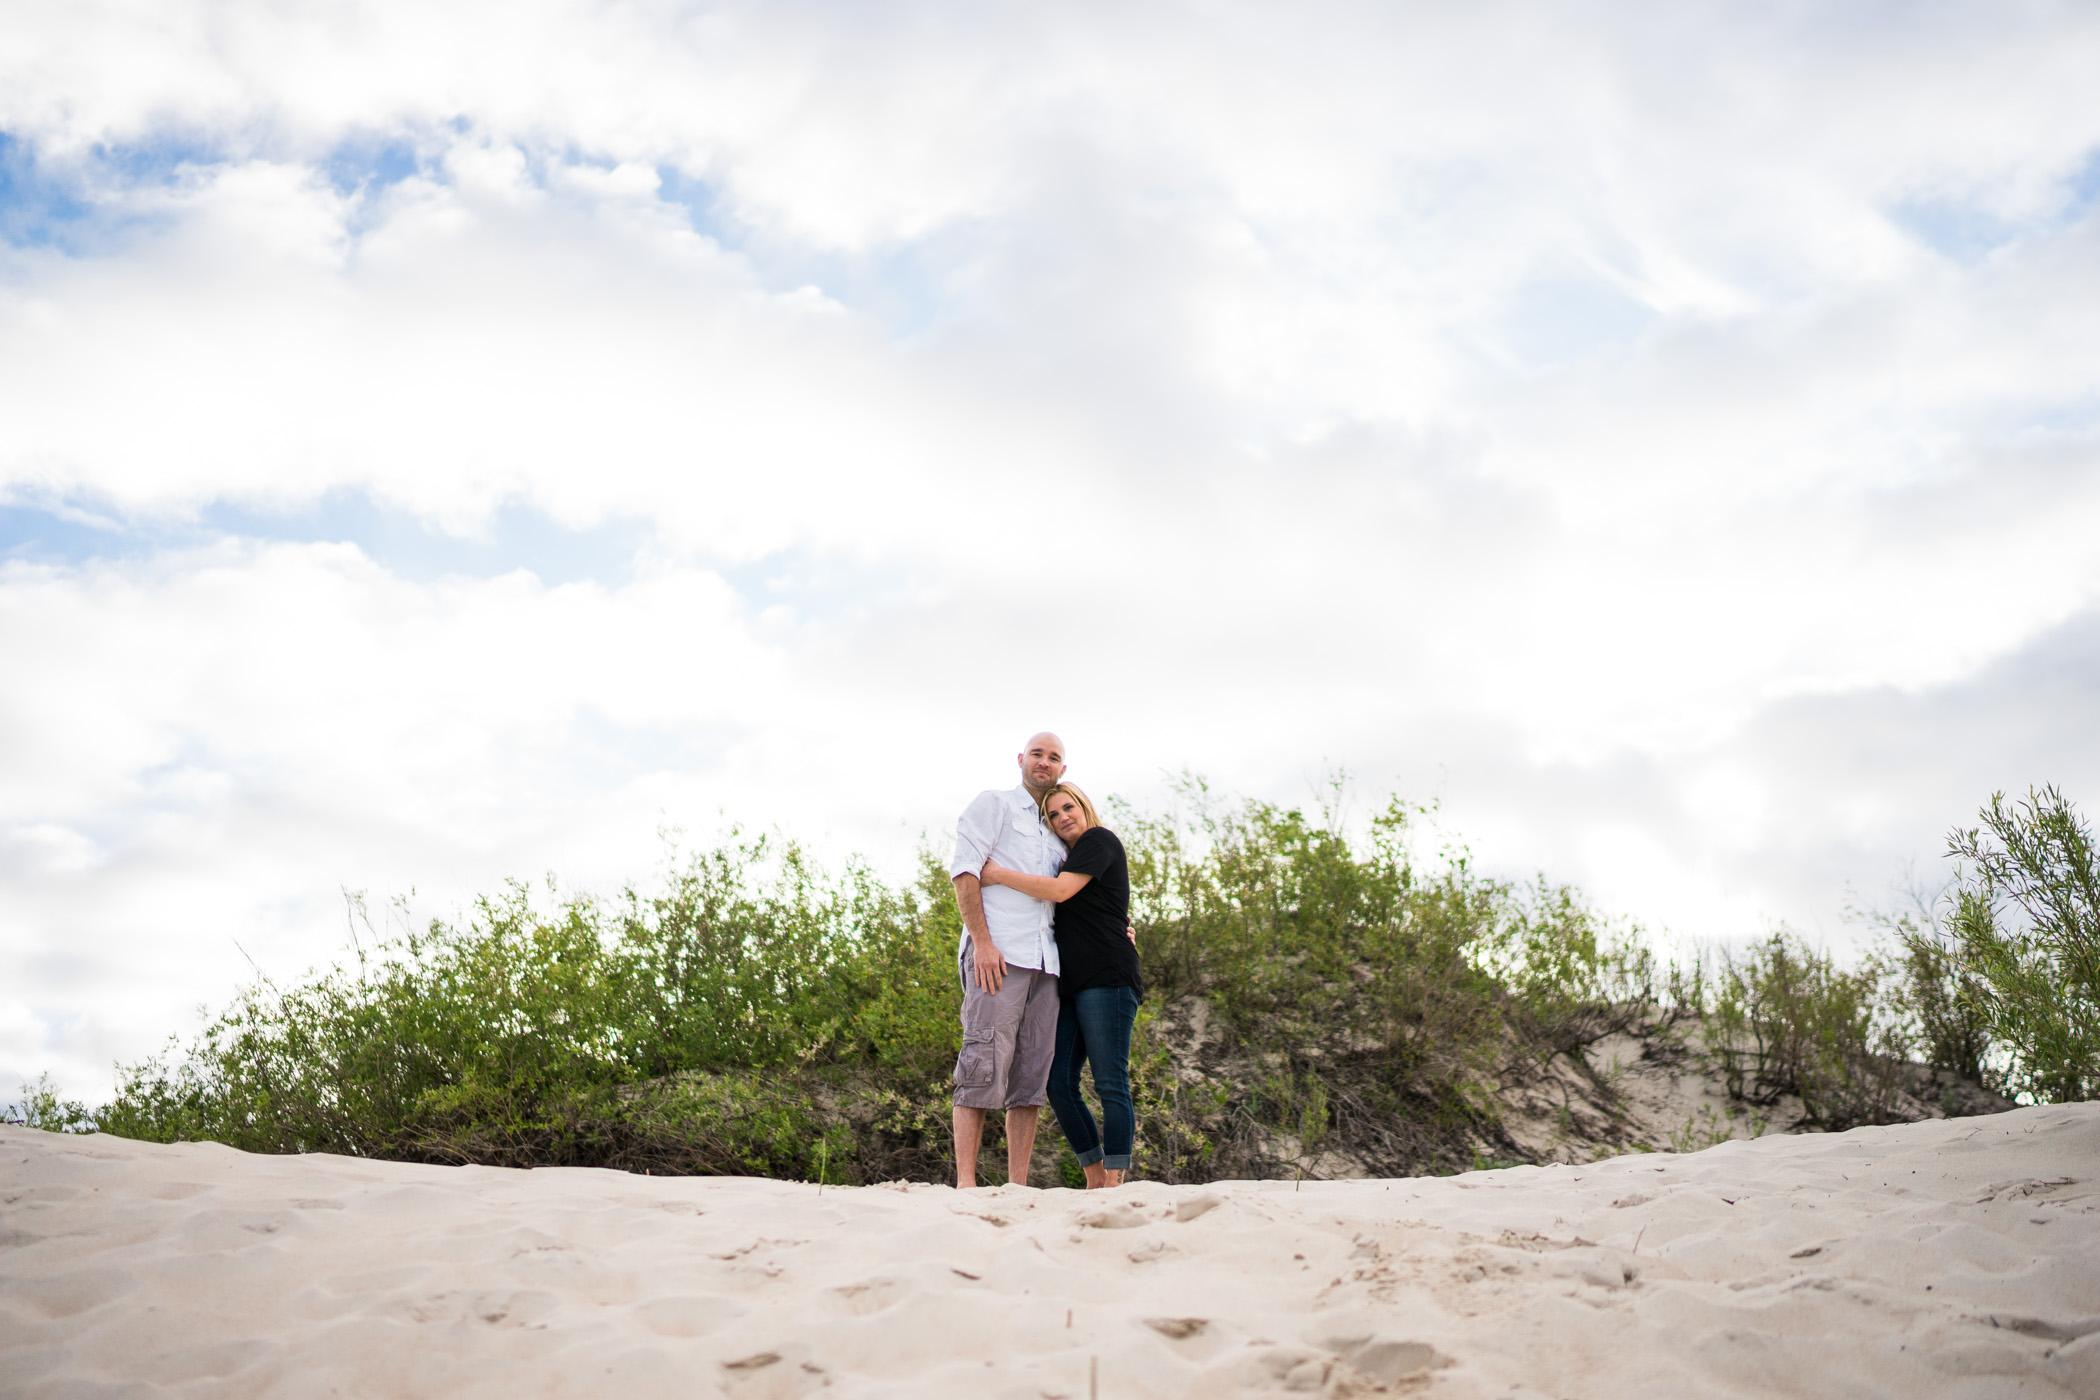 COJO Photo - Jenn and Adam - Engagement-227.jpg